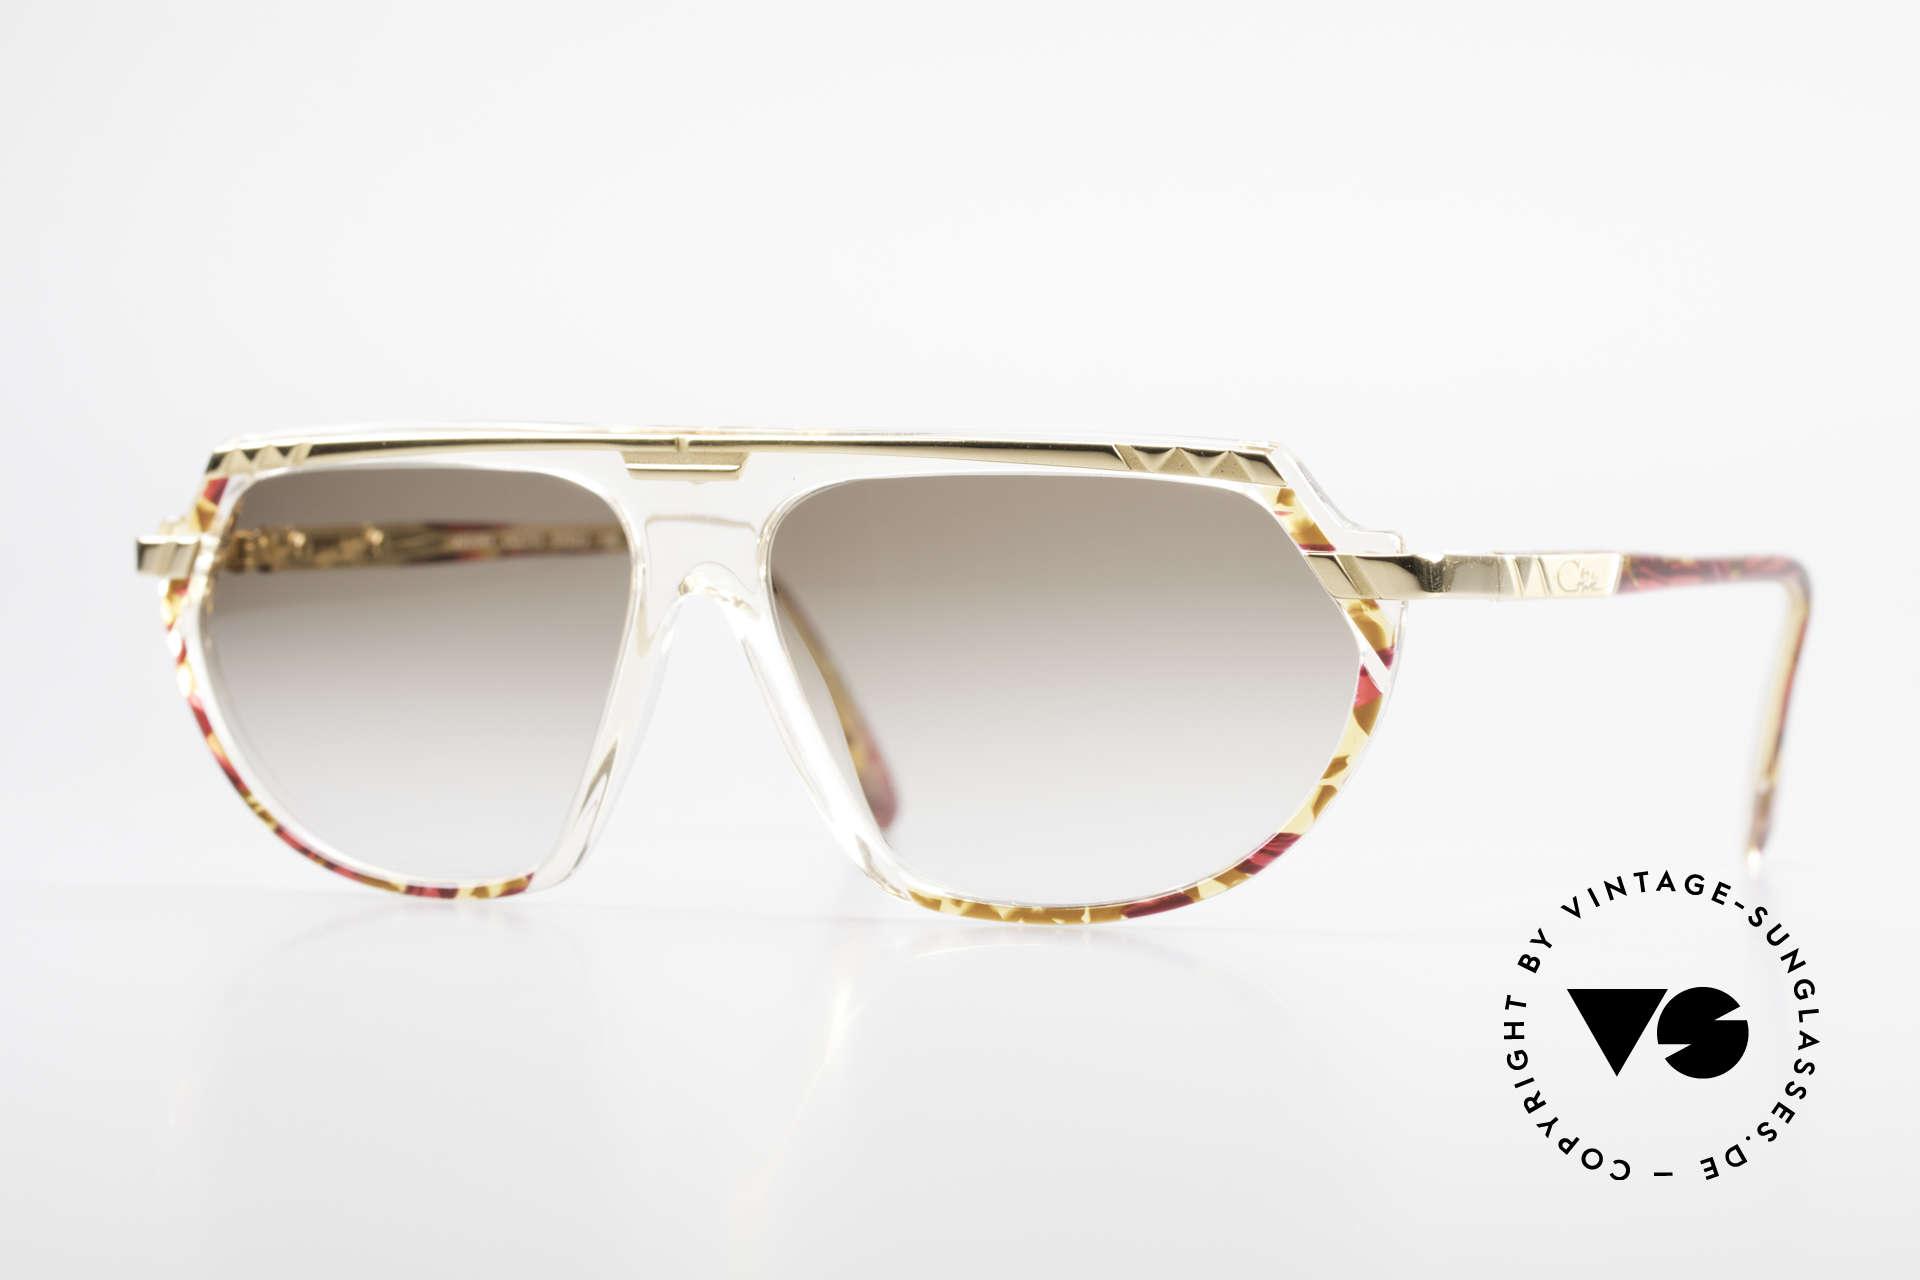 Cazal 344 Old School Crystal Sunglasses, vintage CAZAL designer sunglasses from 1989/1990, Made for Women